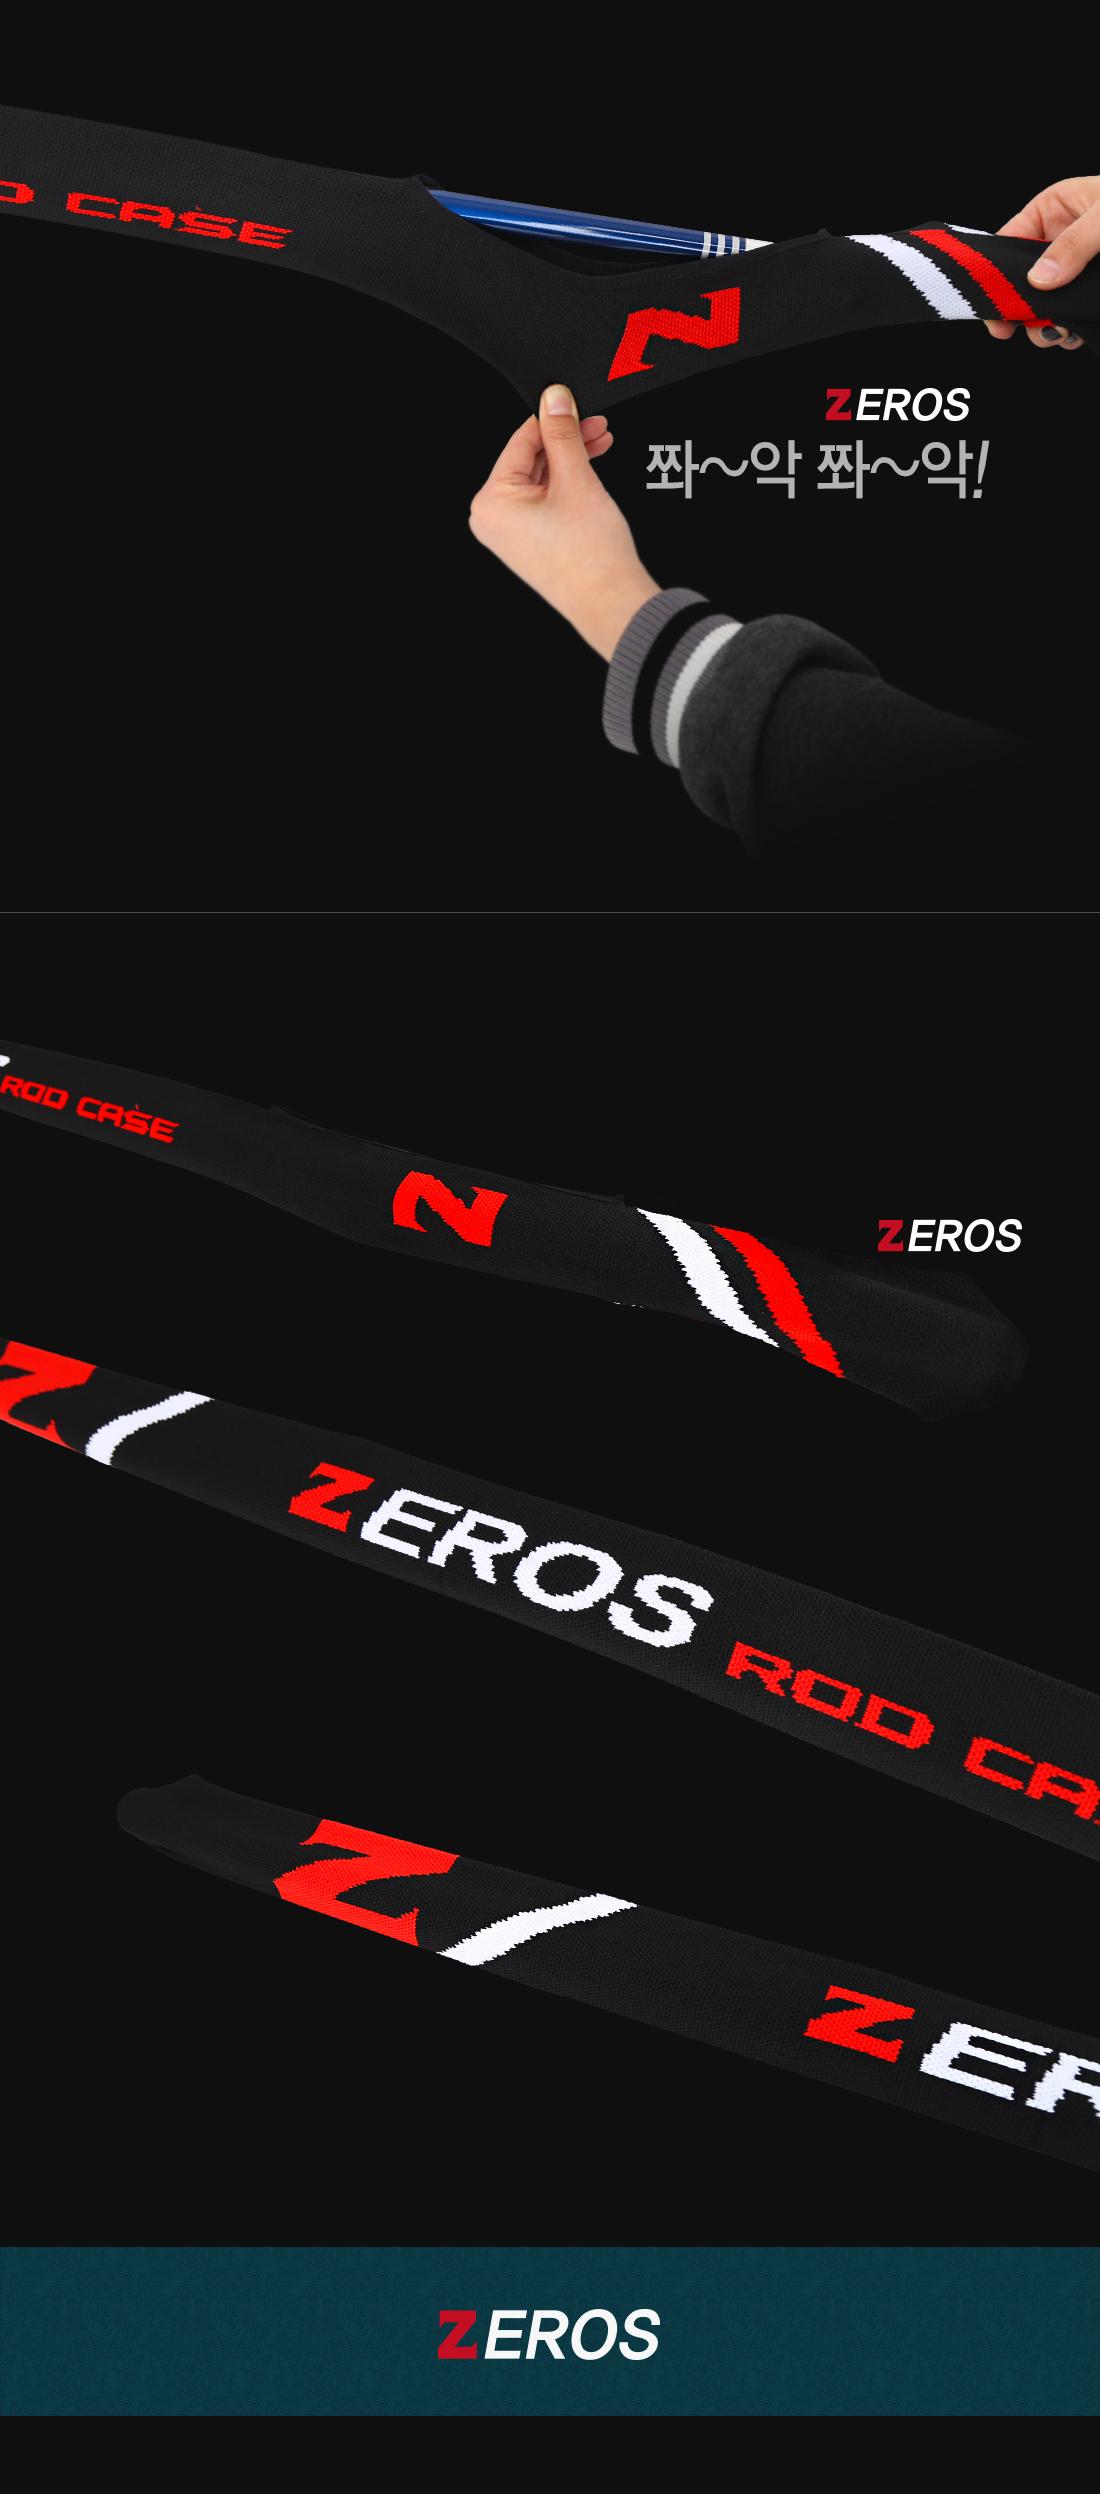 제로스(ZEROS)  스판덱스 로드케이스 스판케이스 스타킹 스타킹케이스 로드케이스 이소대케이스